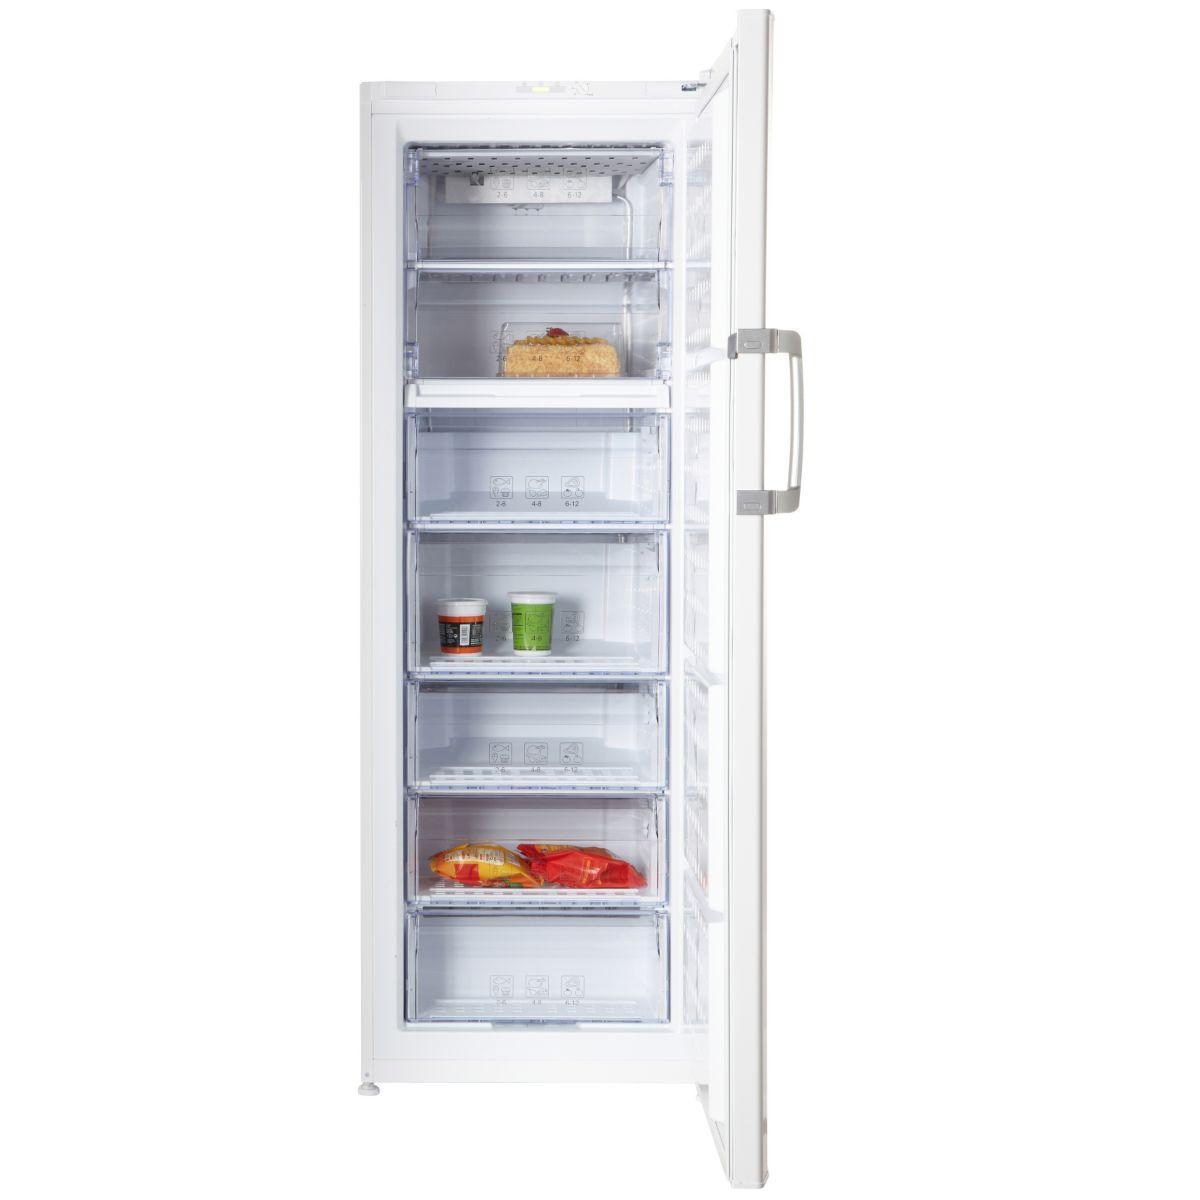 Cong lateur armoire beko fs127320 reconditionn back market - Congelateur beko armoire ...